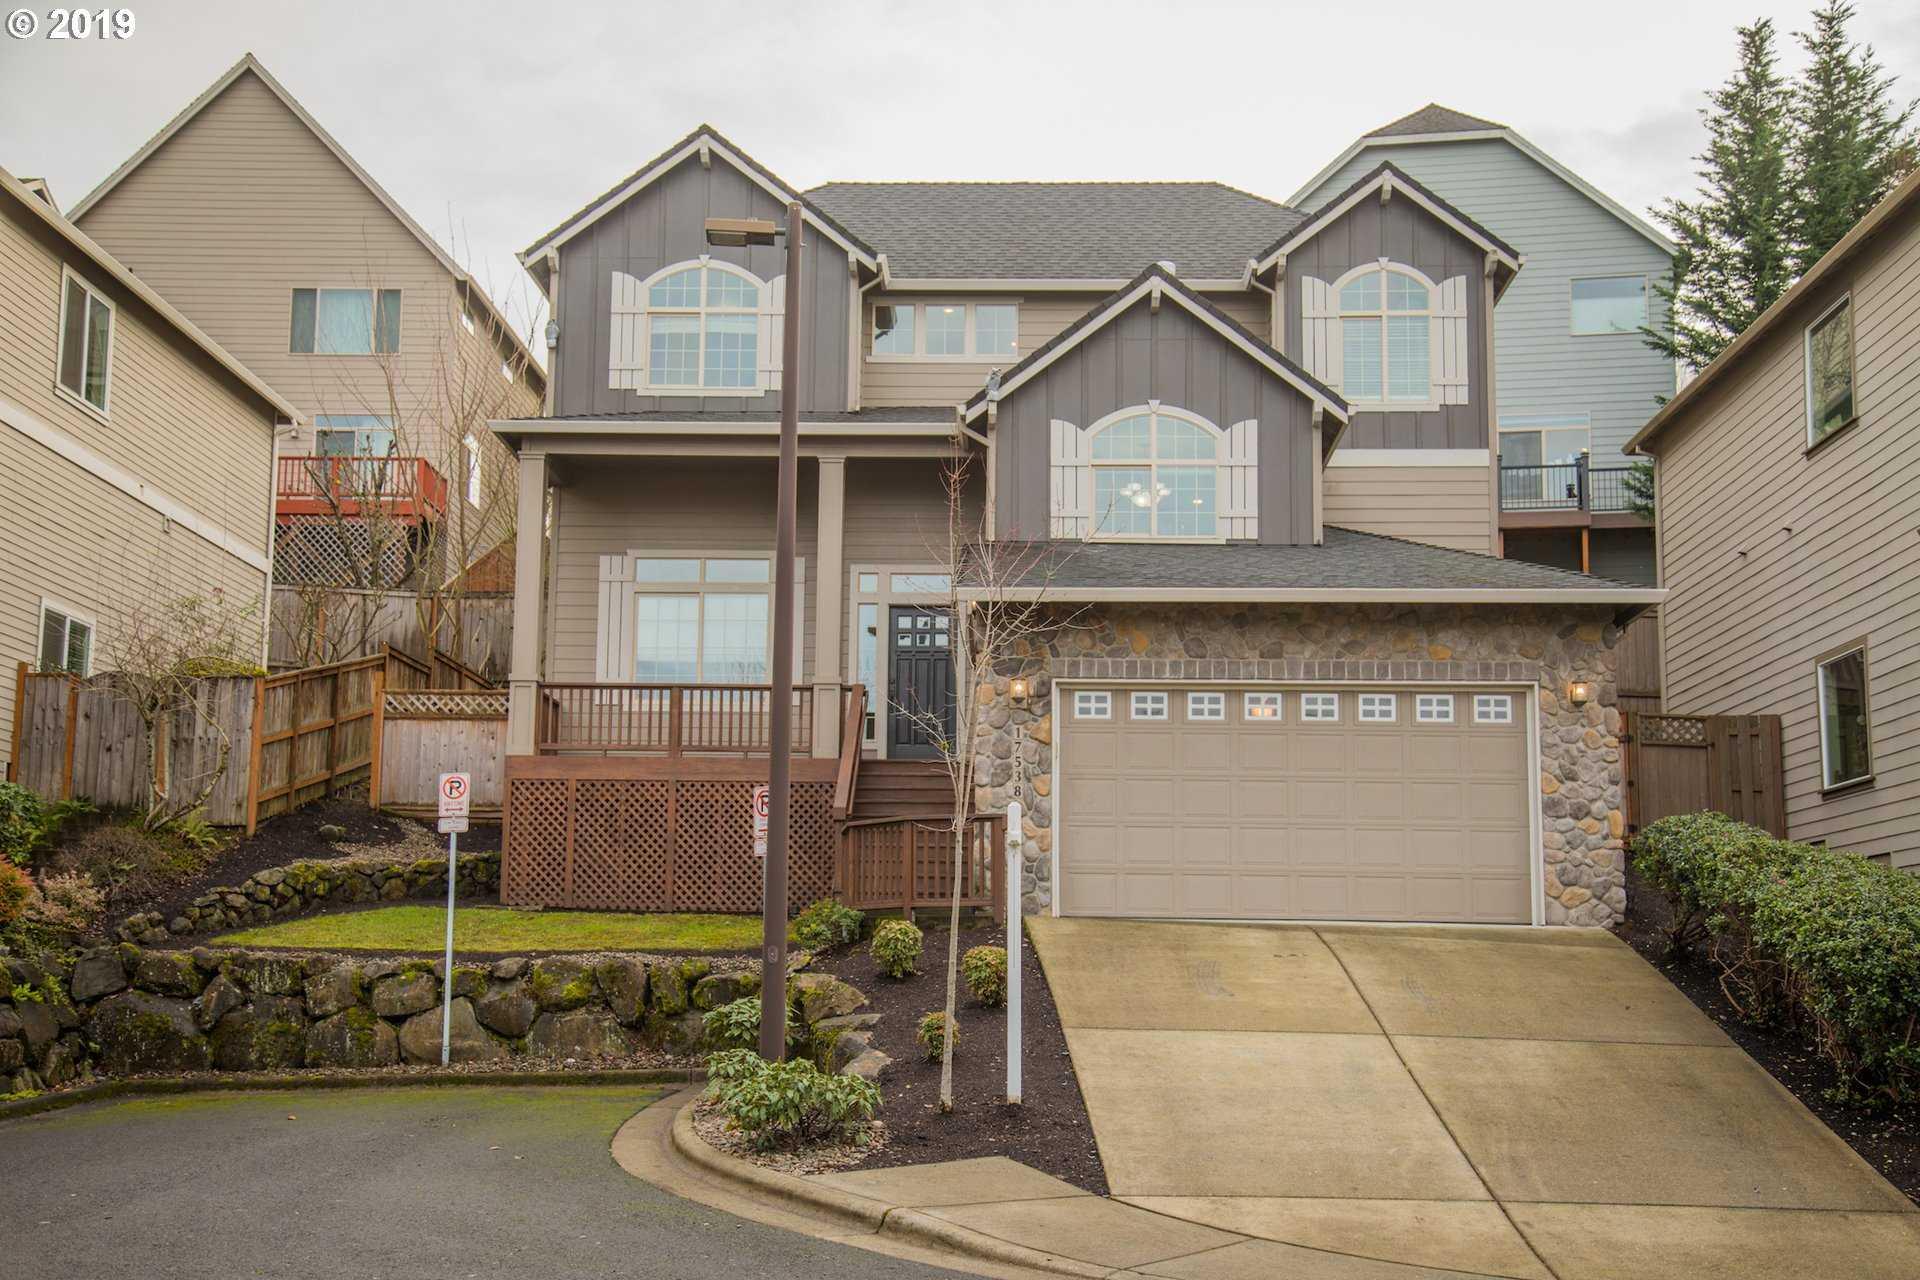 $489,900 - 3Br/3Ba -  for Sale in Beaverton